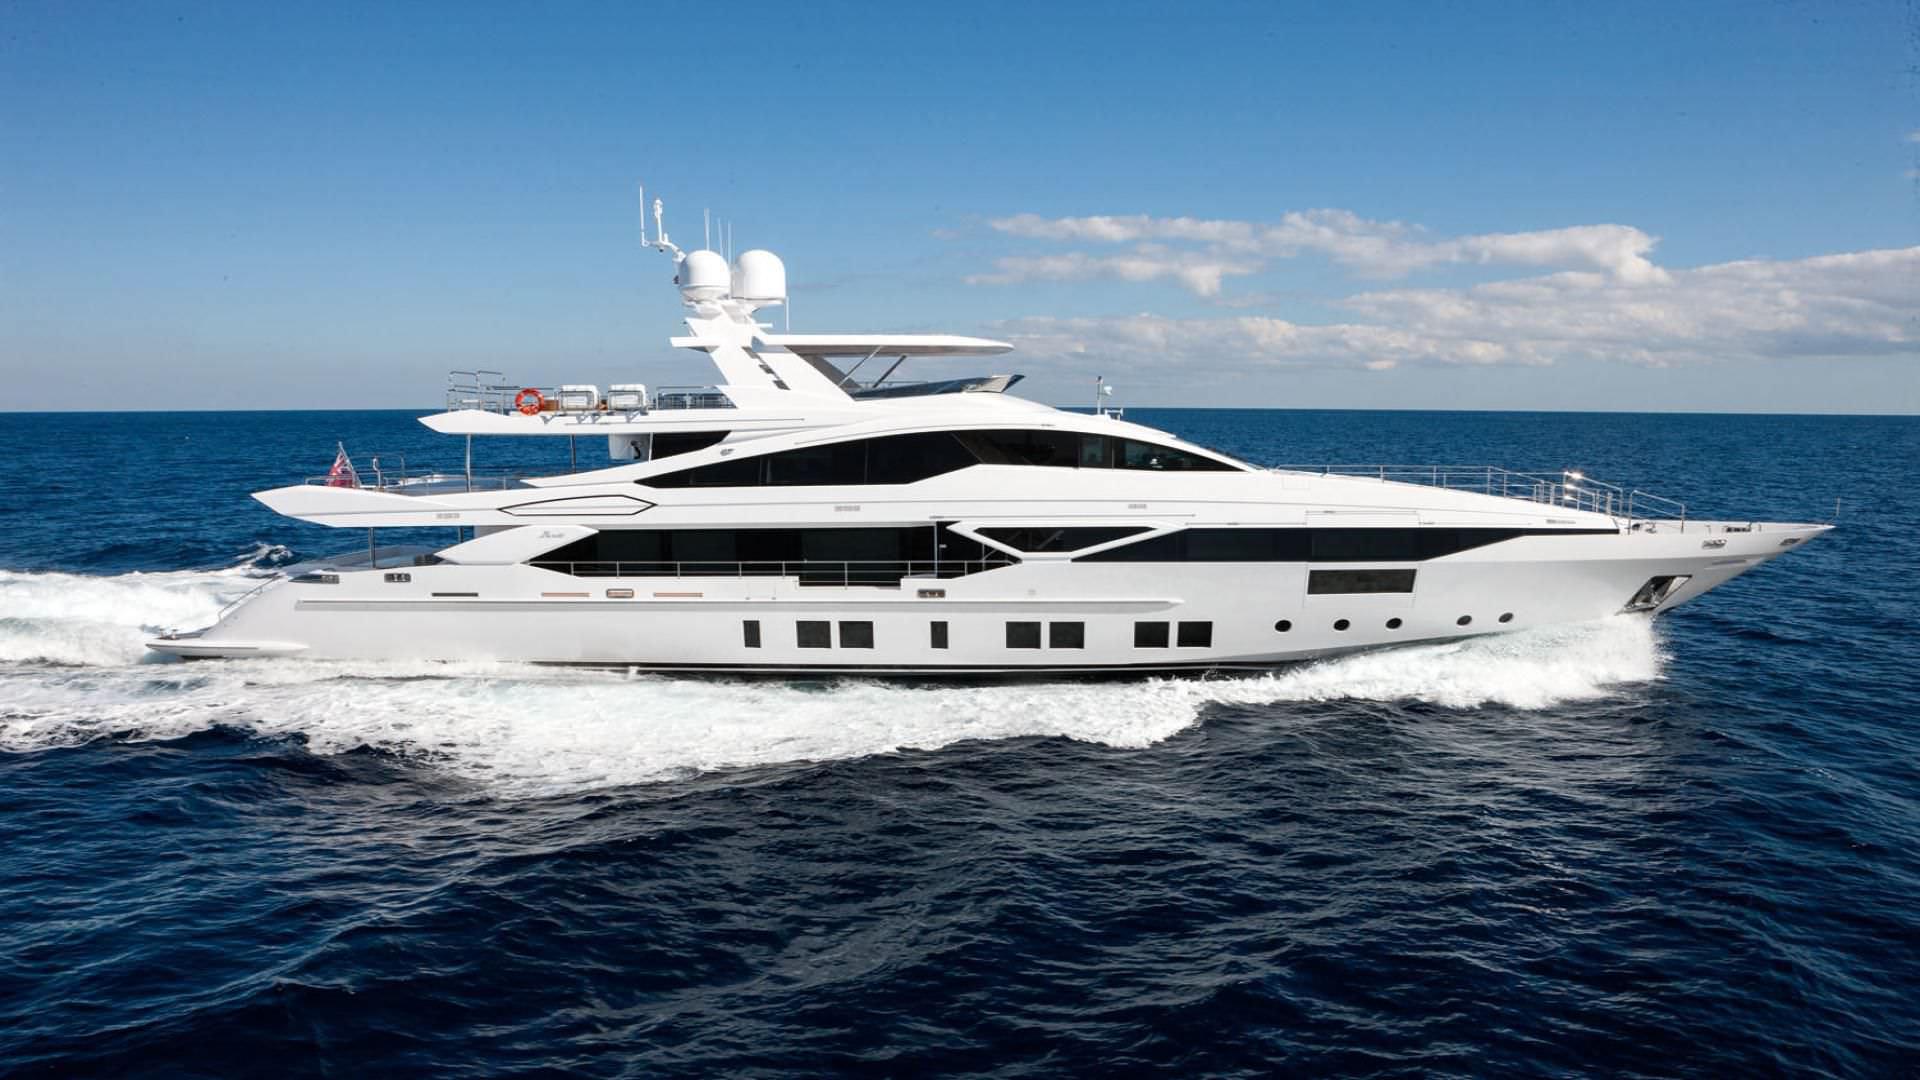 Standard super-yacht / displacement hull / custom